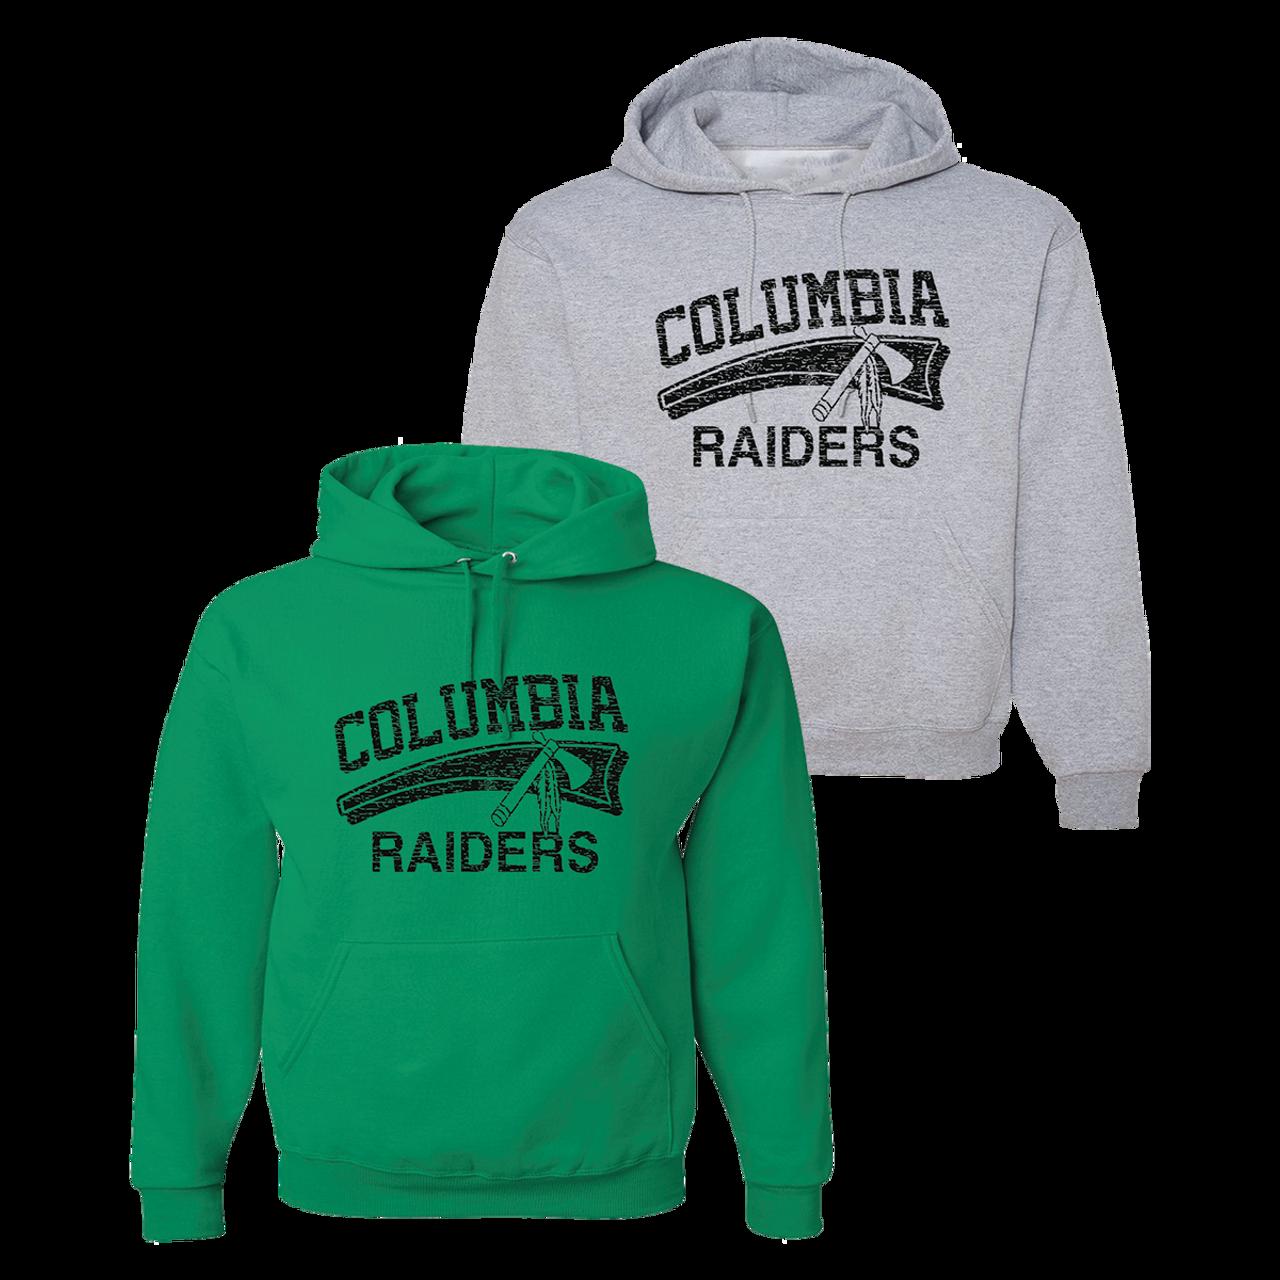 822aadc5c99aa Columbia Raiders Hoodie (F185) - RycoSports